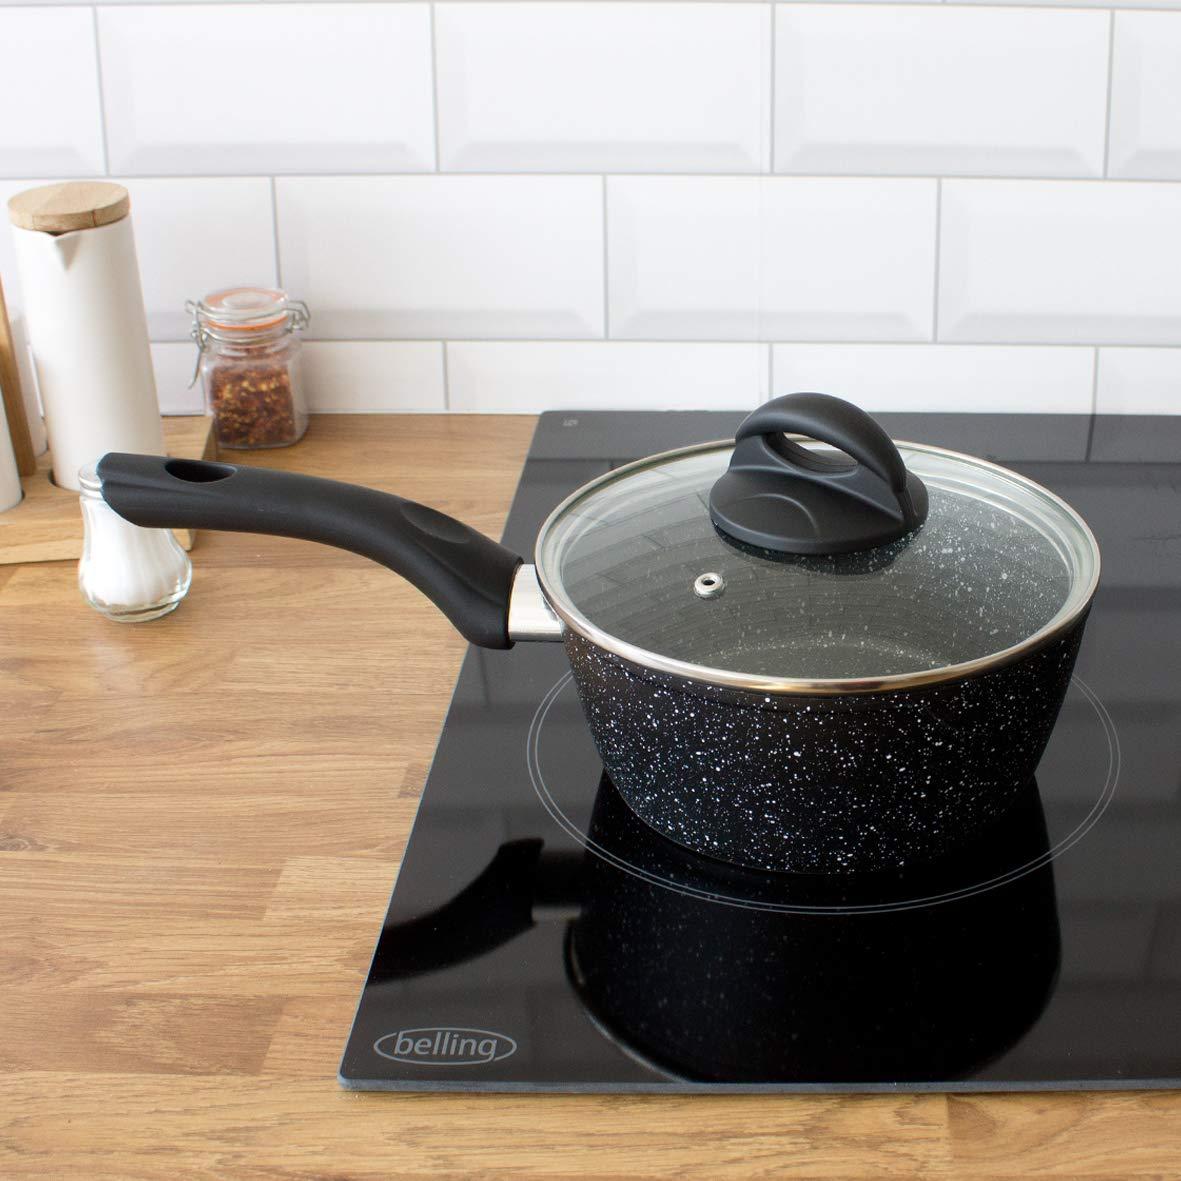 Blackmoor 65740 18cm Non-Stick Saucepan and Lid, Black